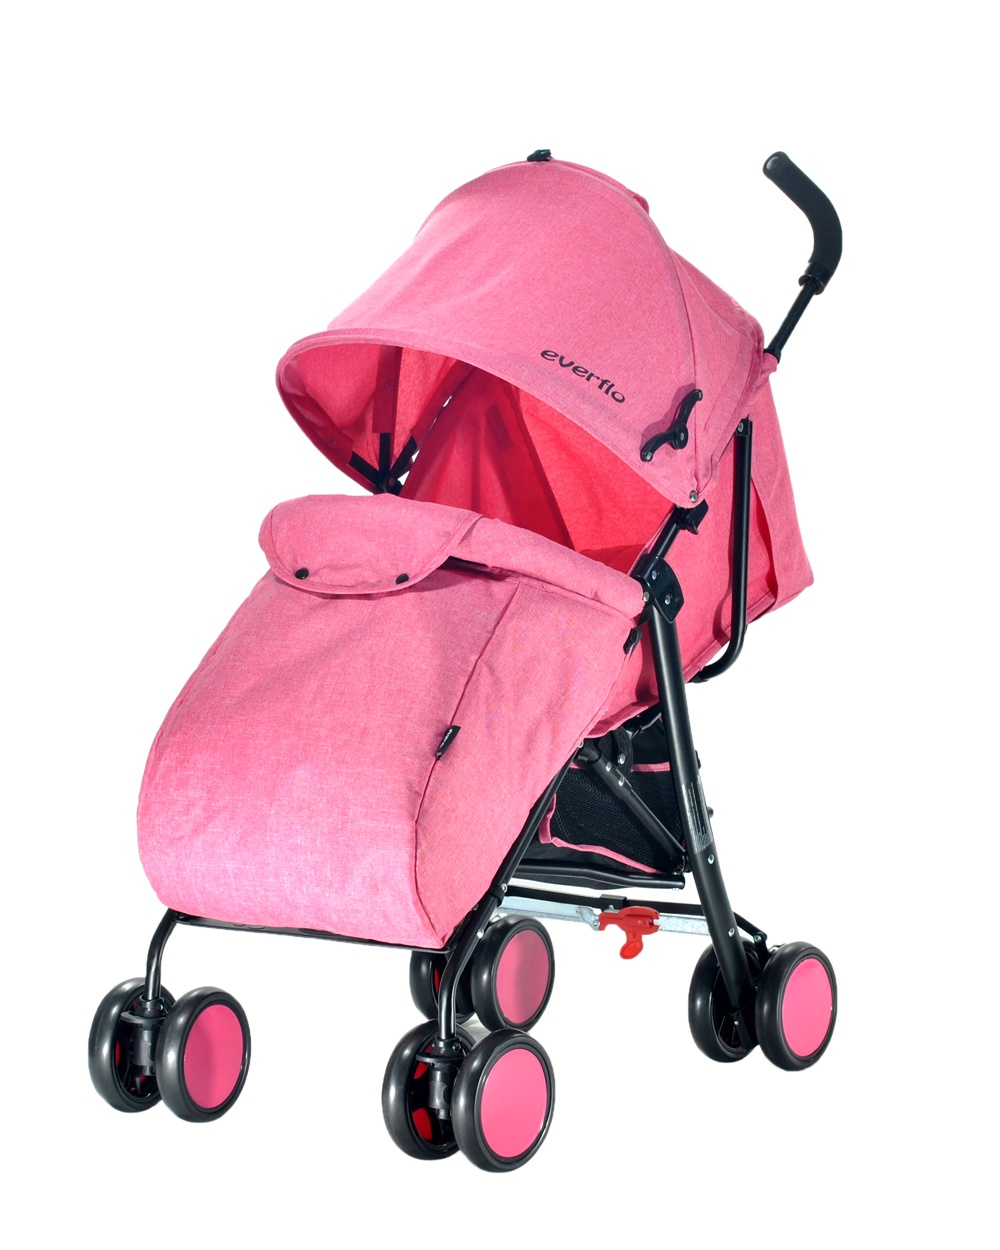 Коляска прогулочная Everflo Voyage pink E-850A розовый коляска трость everflo voyage e 850a blue